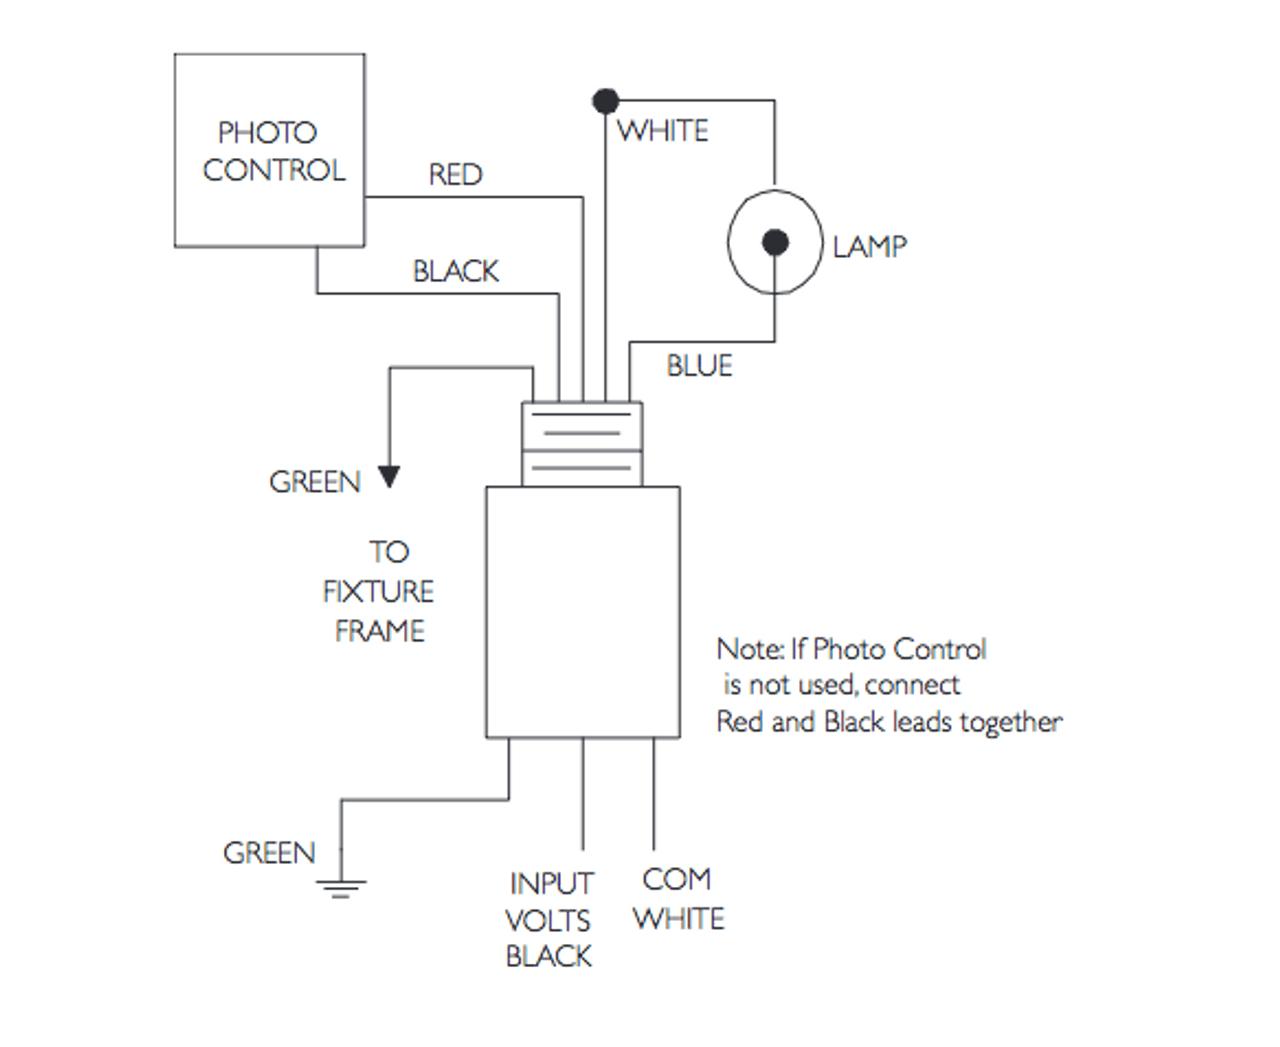 advance hps ballast wiring diagram wiring diagram schematic 100w hps ballast kit wiring diagram [ 1280 x 1047 Pixel ]